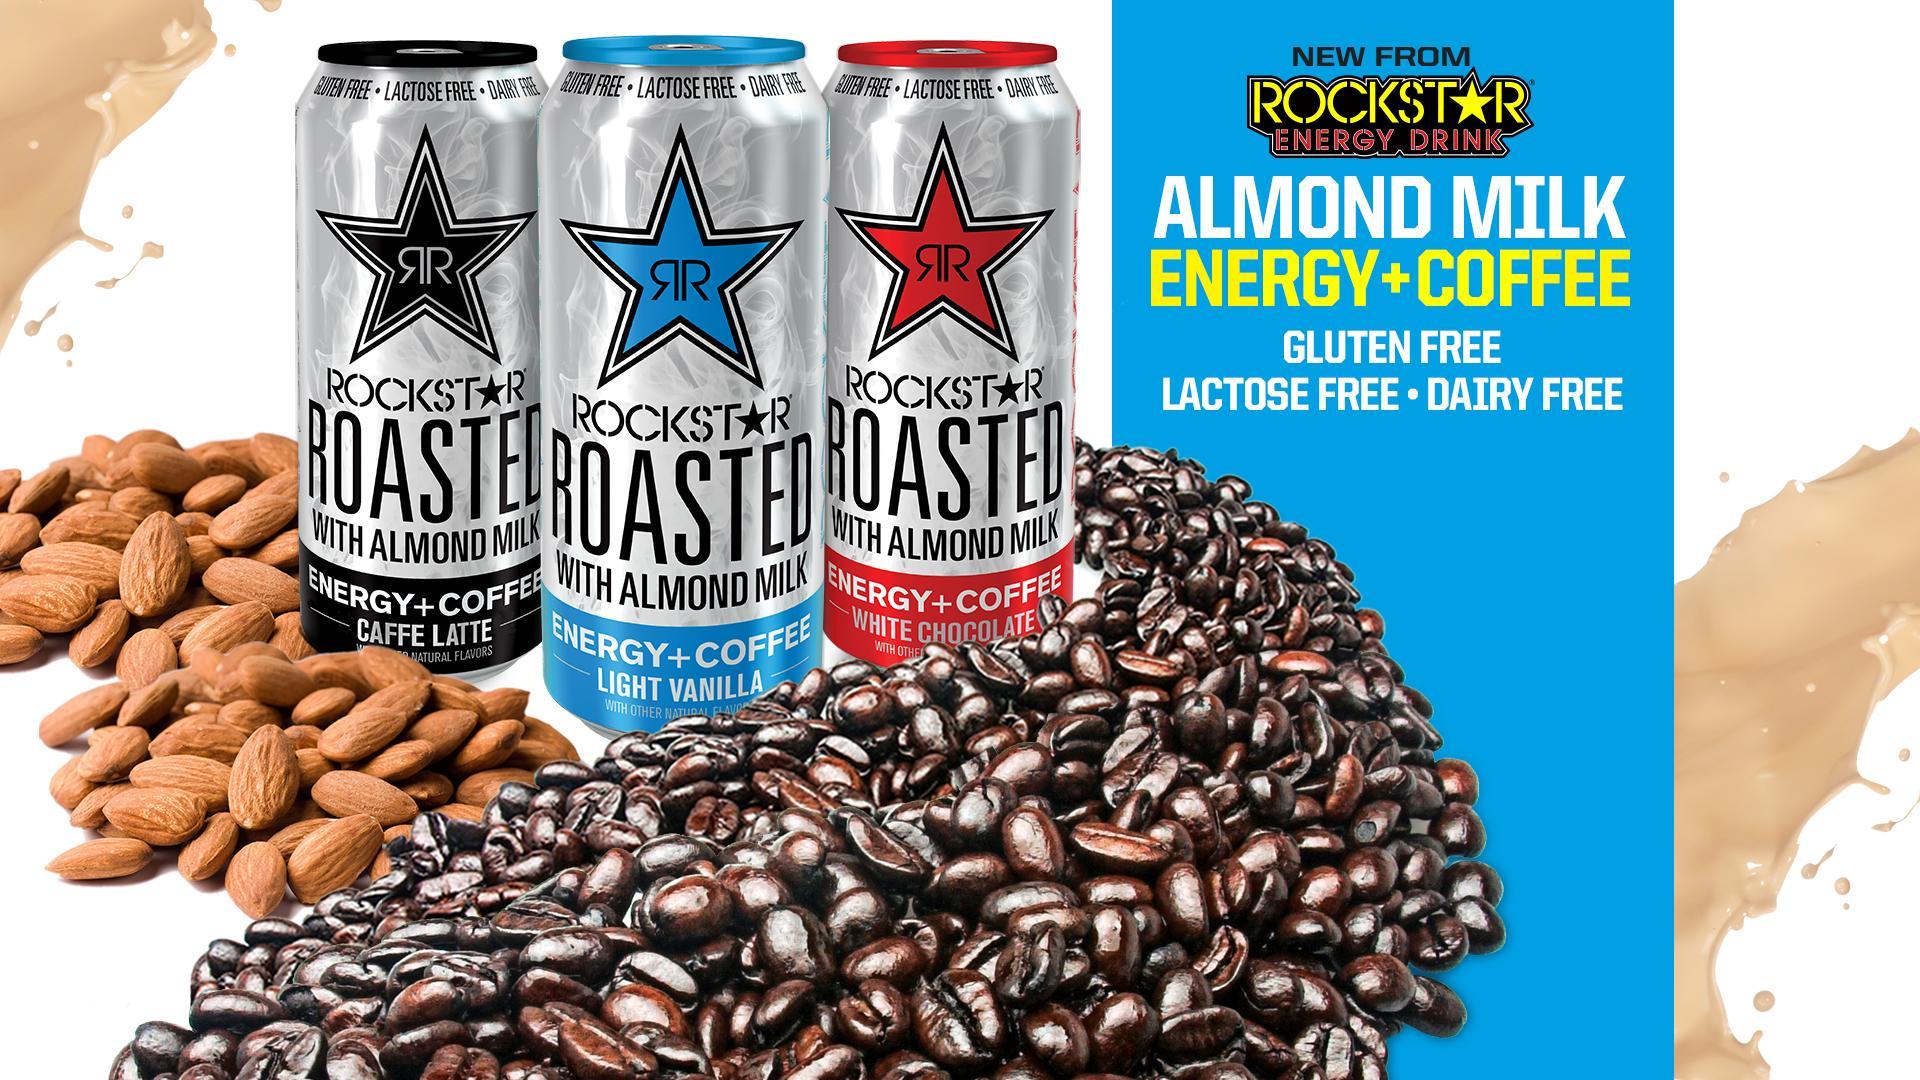 Rockstar Roasted With Almond Milk Light Vanilla Tims Energy Blog